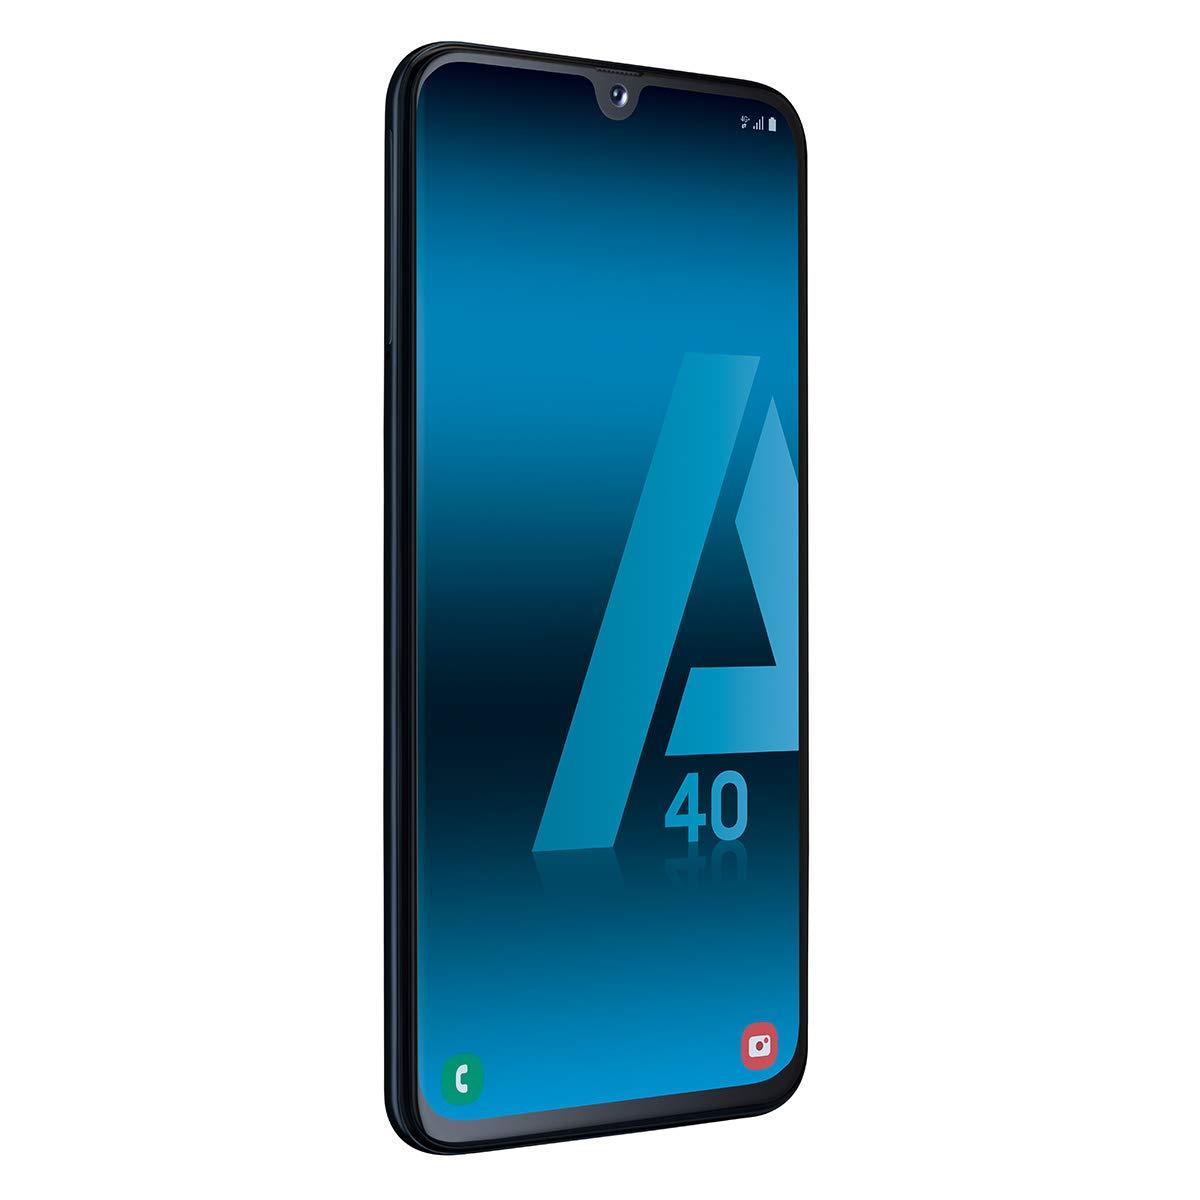 c3e1646db7c Samsung Galaxy A40 - Smartphone de 5.9